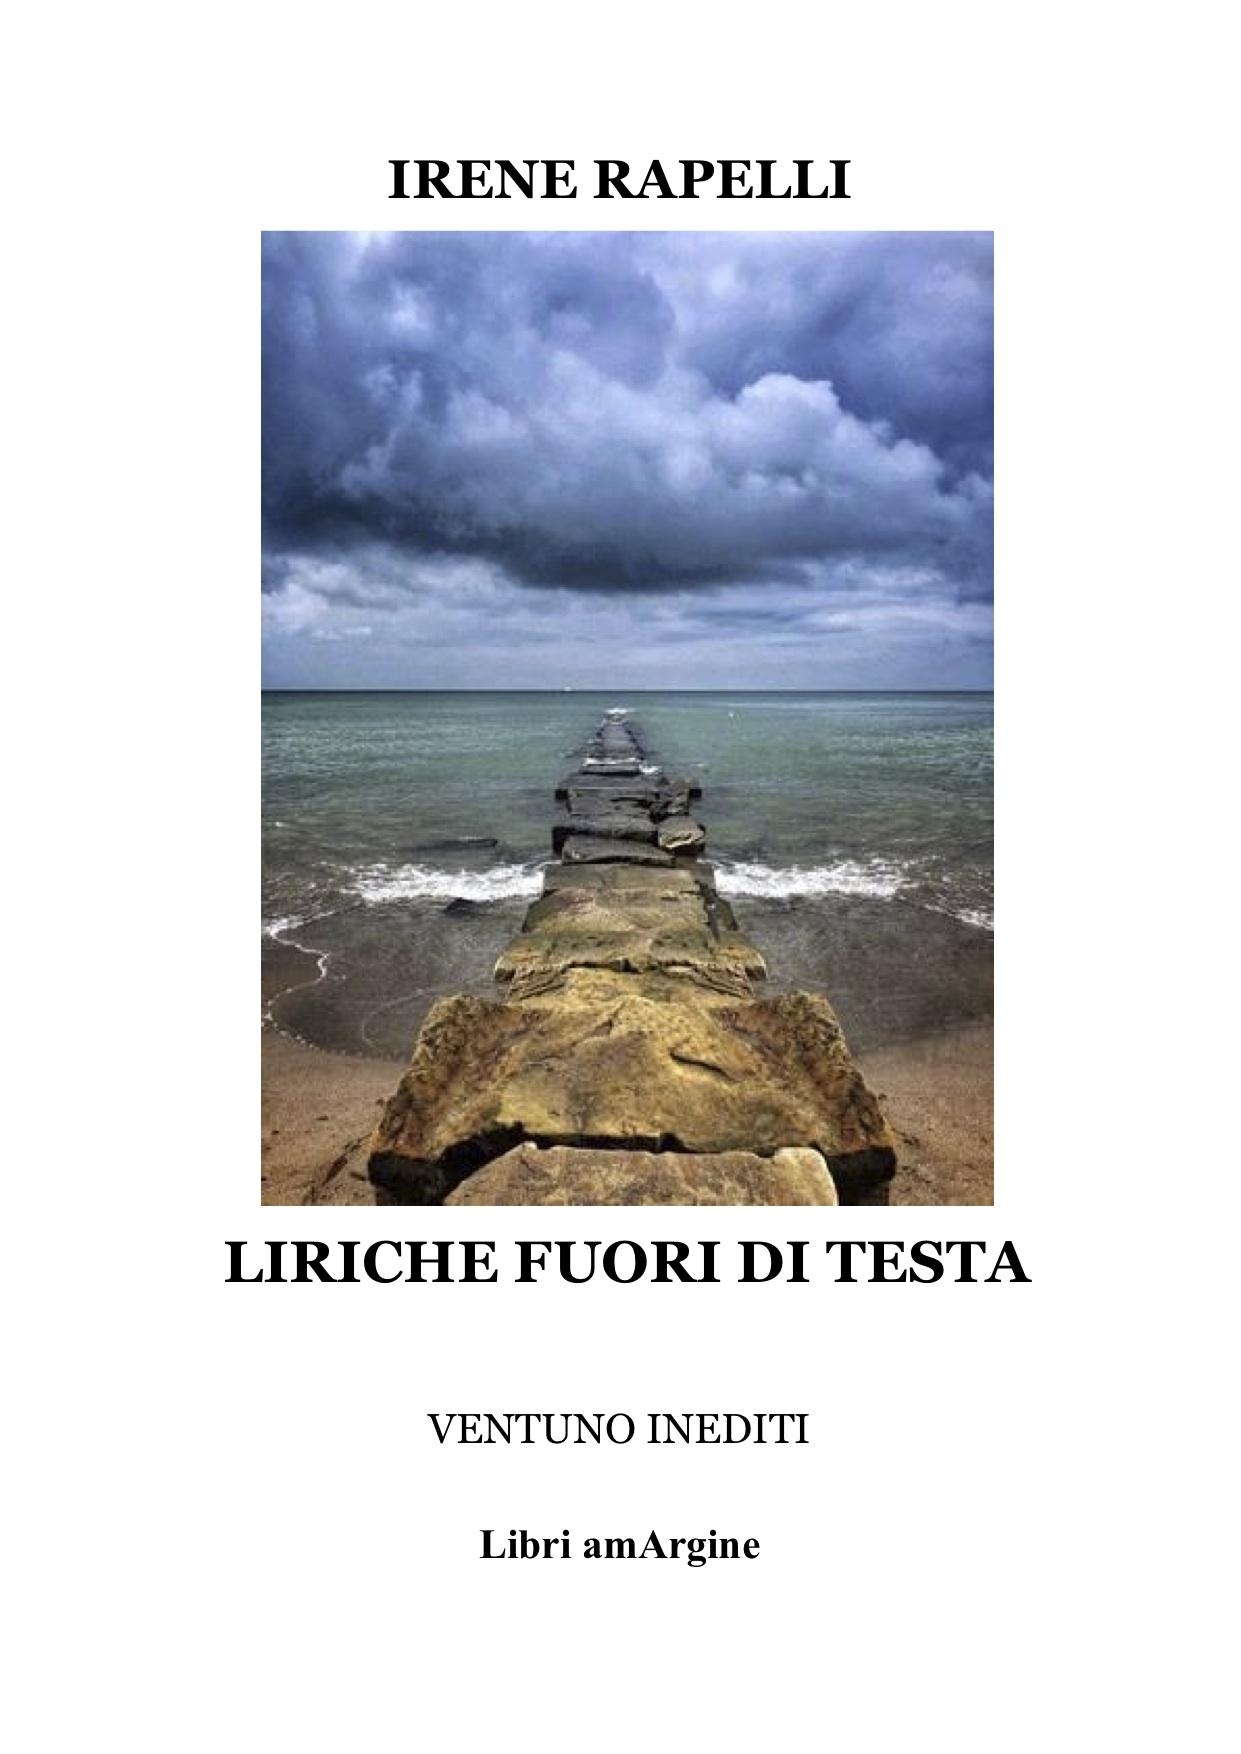 libri-amargine-2-irene-rapelli (trascinato).jpg